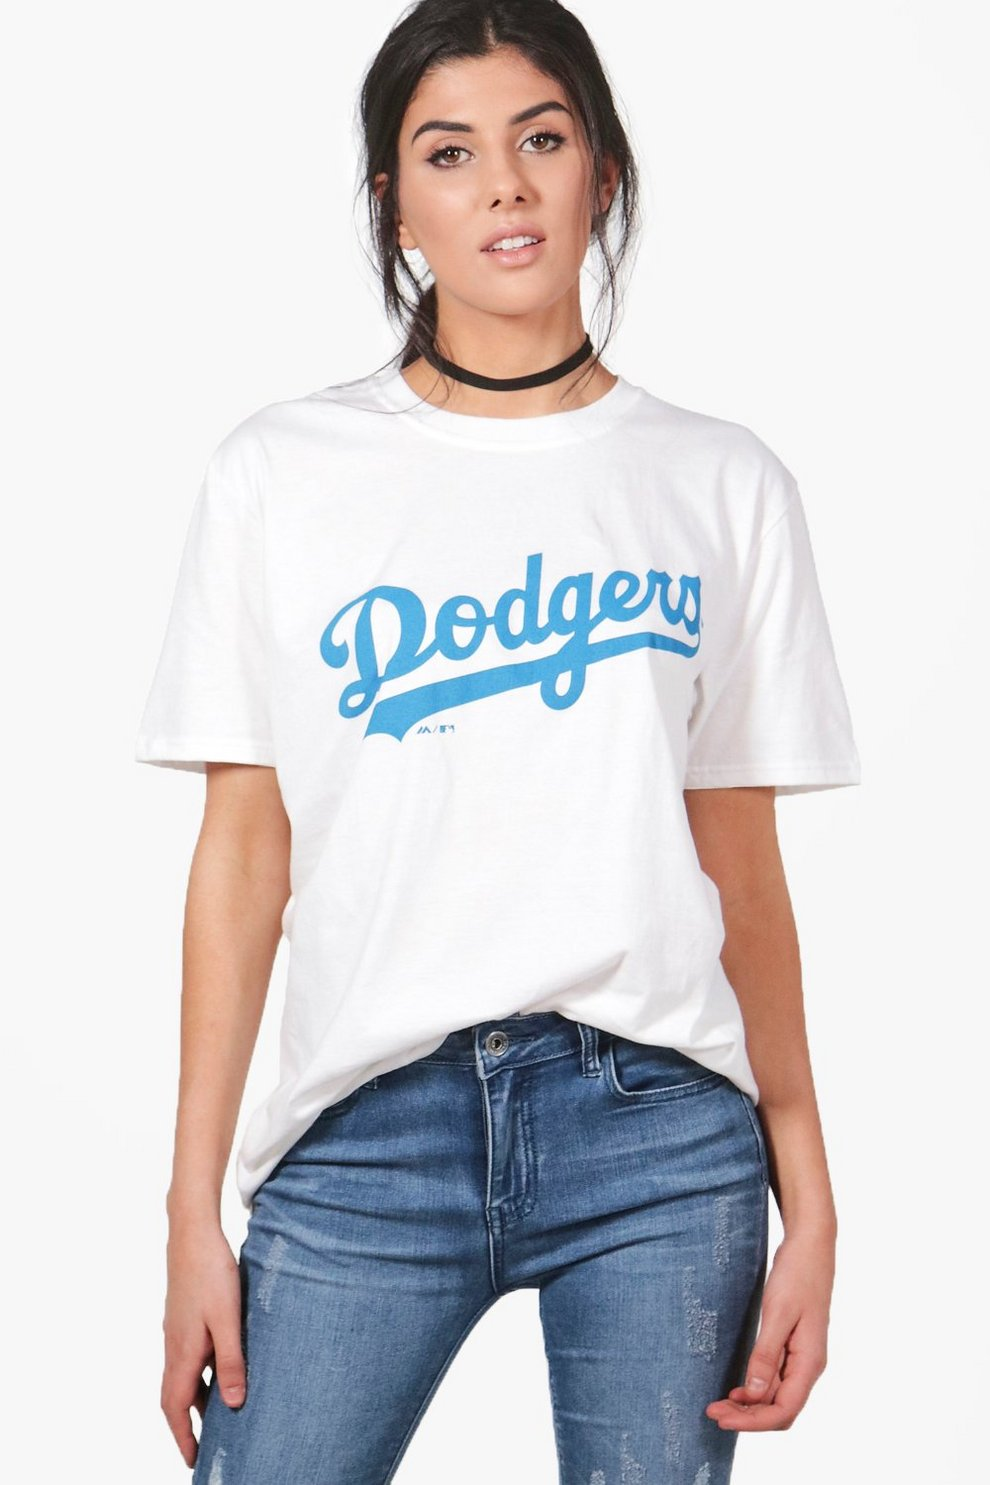 72f4fde4c9e8f Lucy Dodgers Oversized Licence Tee | Boohoo